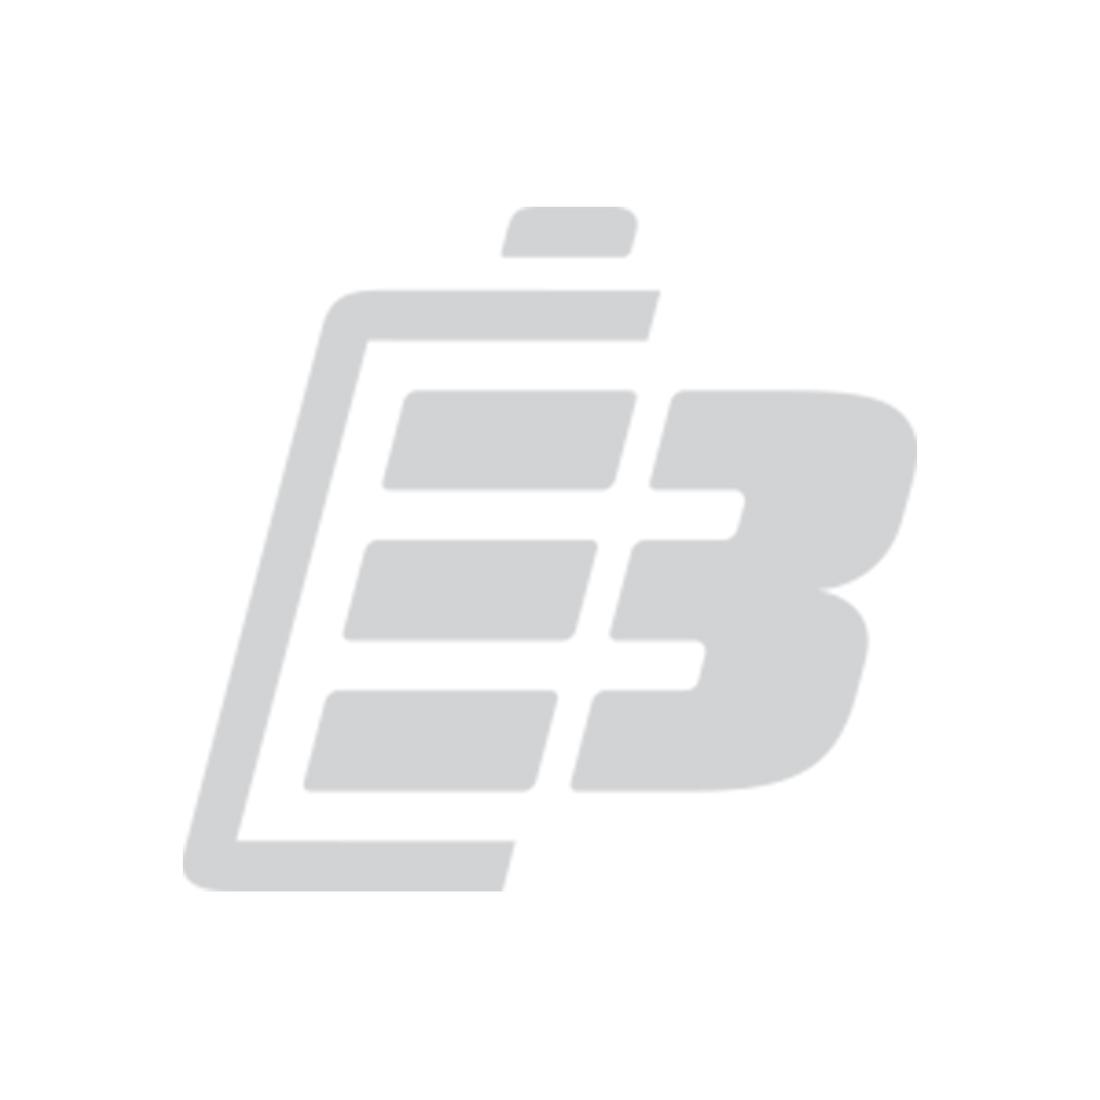 395 - 399 Energizer button Battery